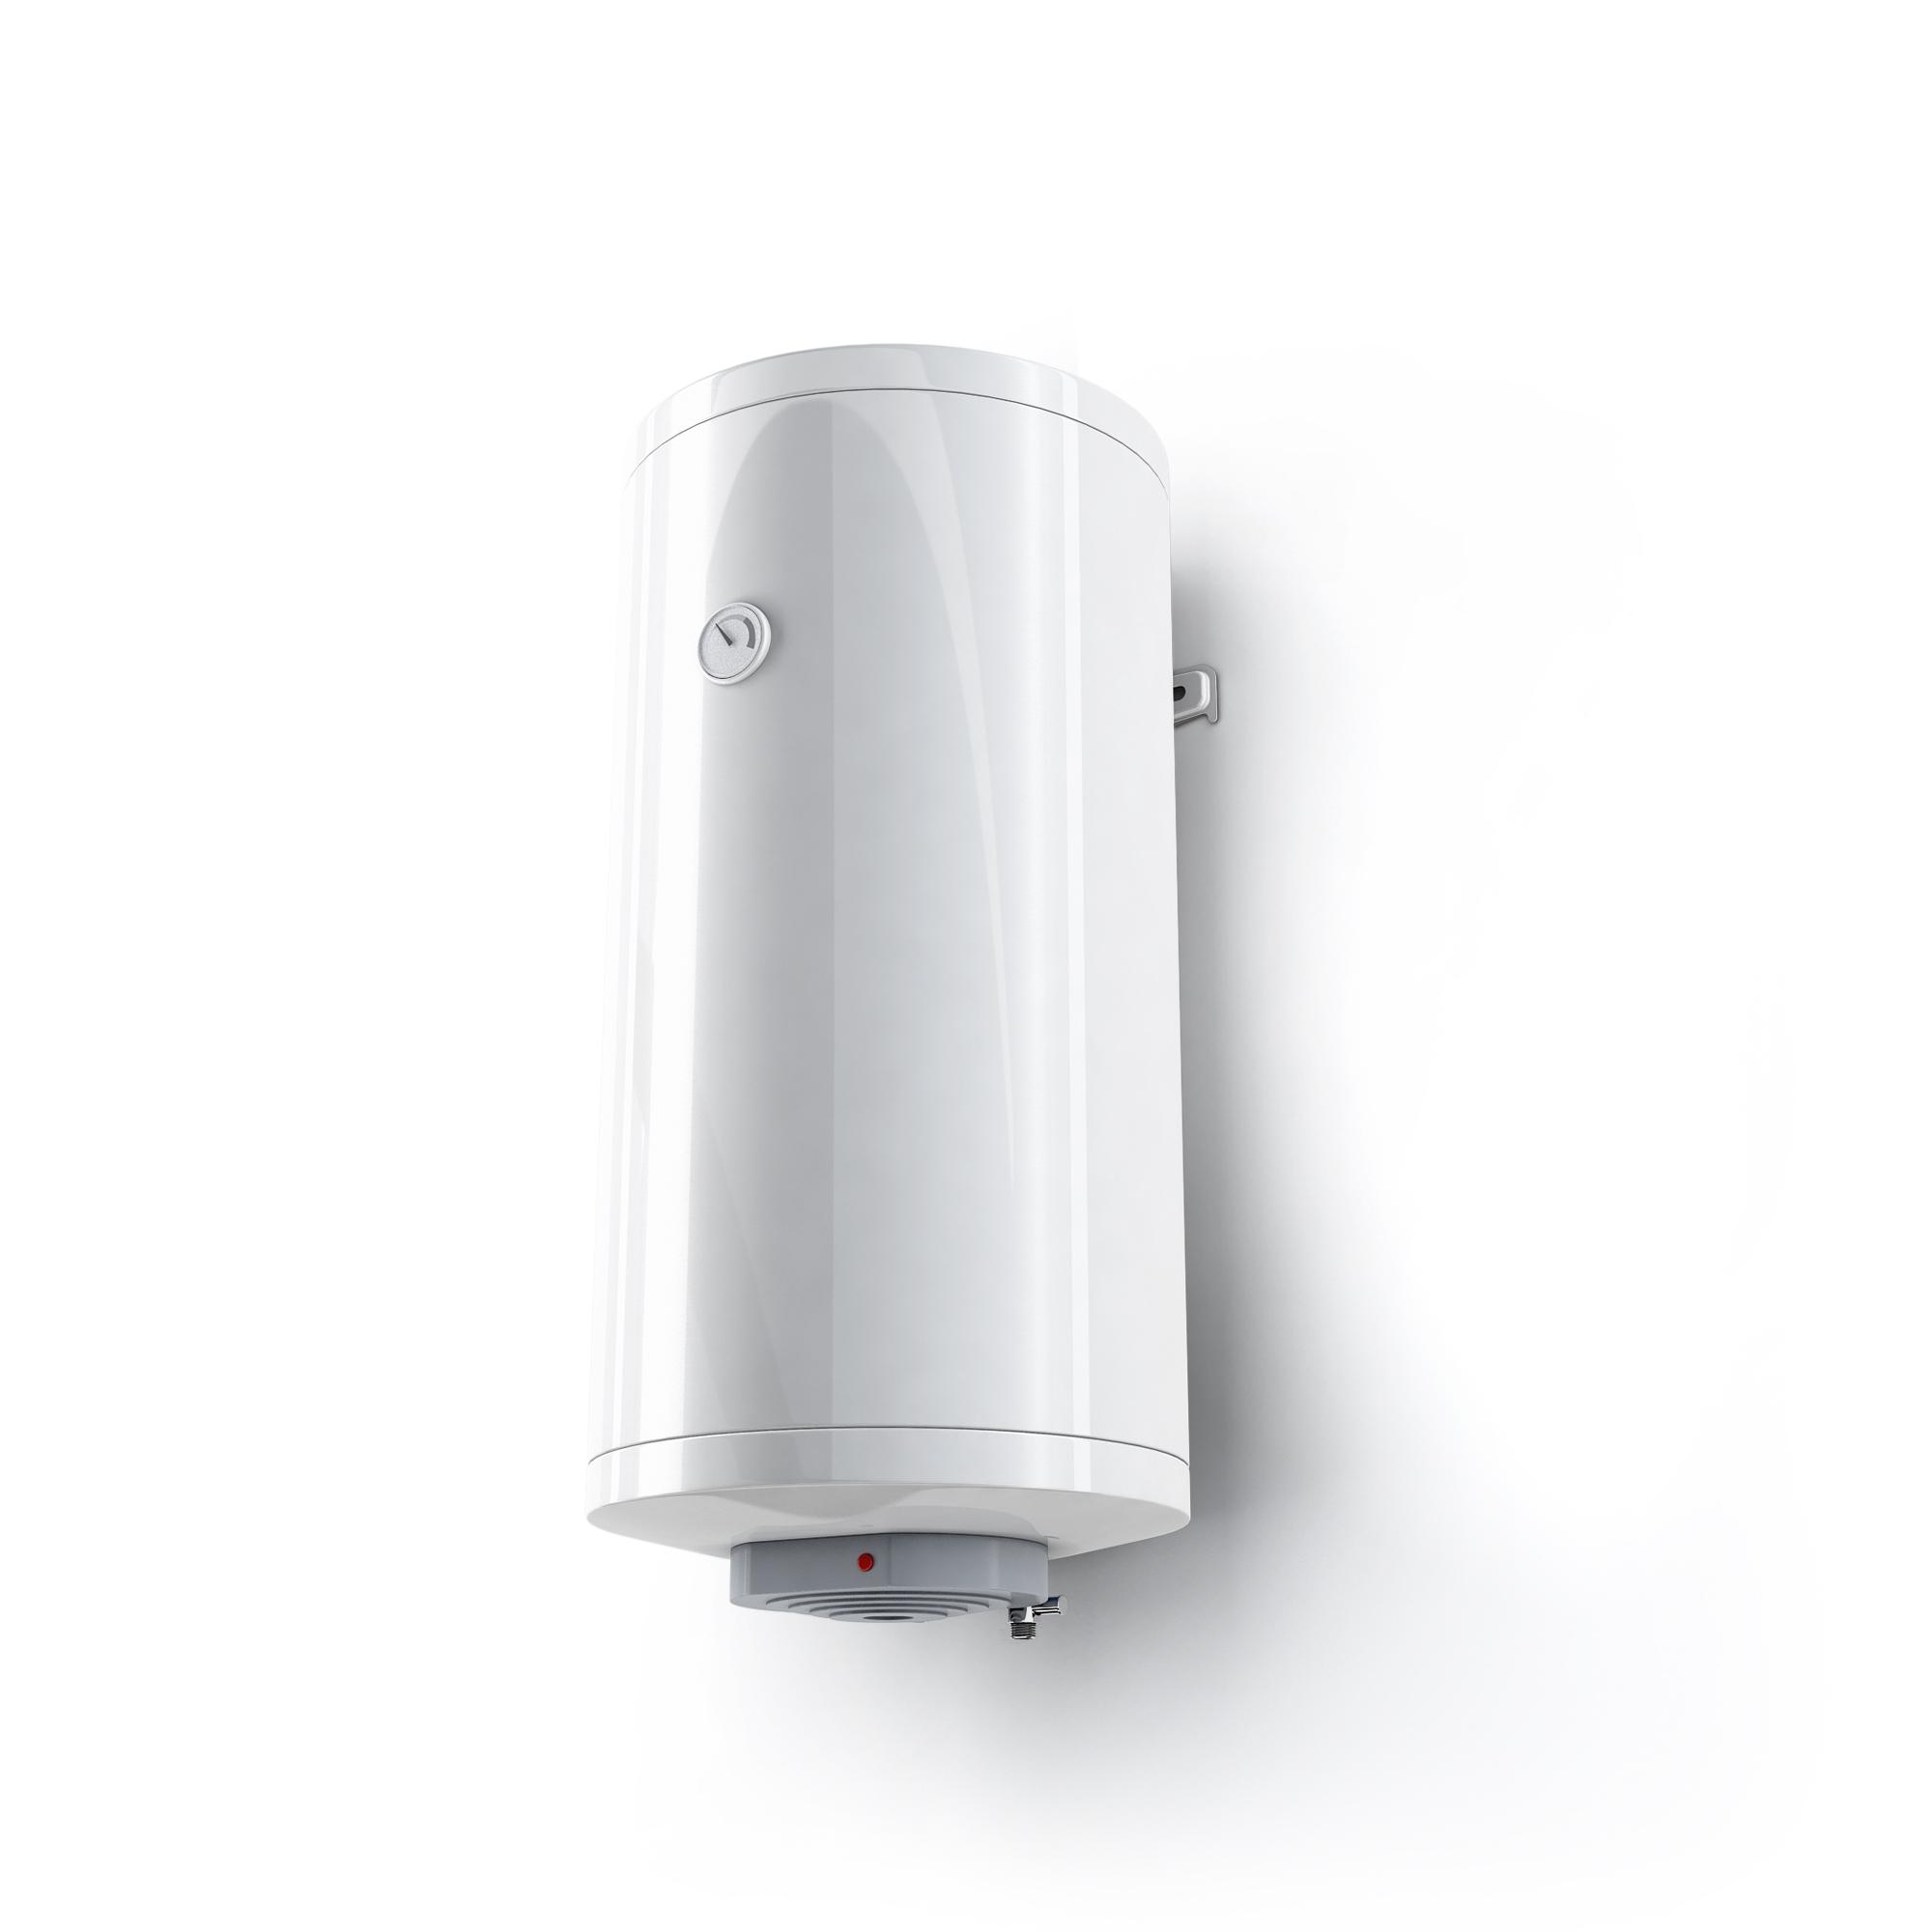 elektrospeicher warmwasserspeicher boiler 30l 50l 80l 100l. Black Bedroom Furniture Sets. Home Design Ideas